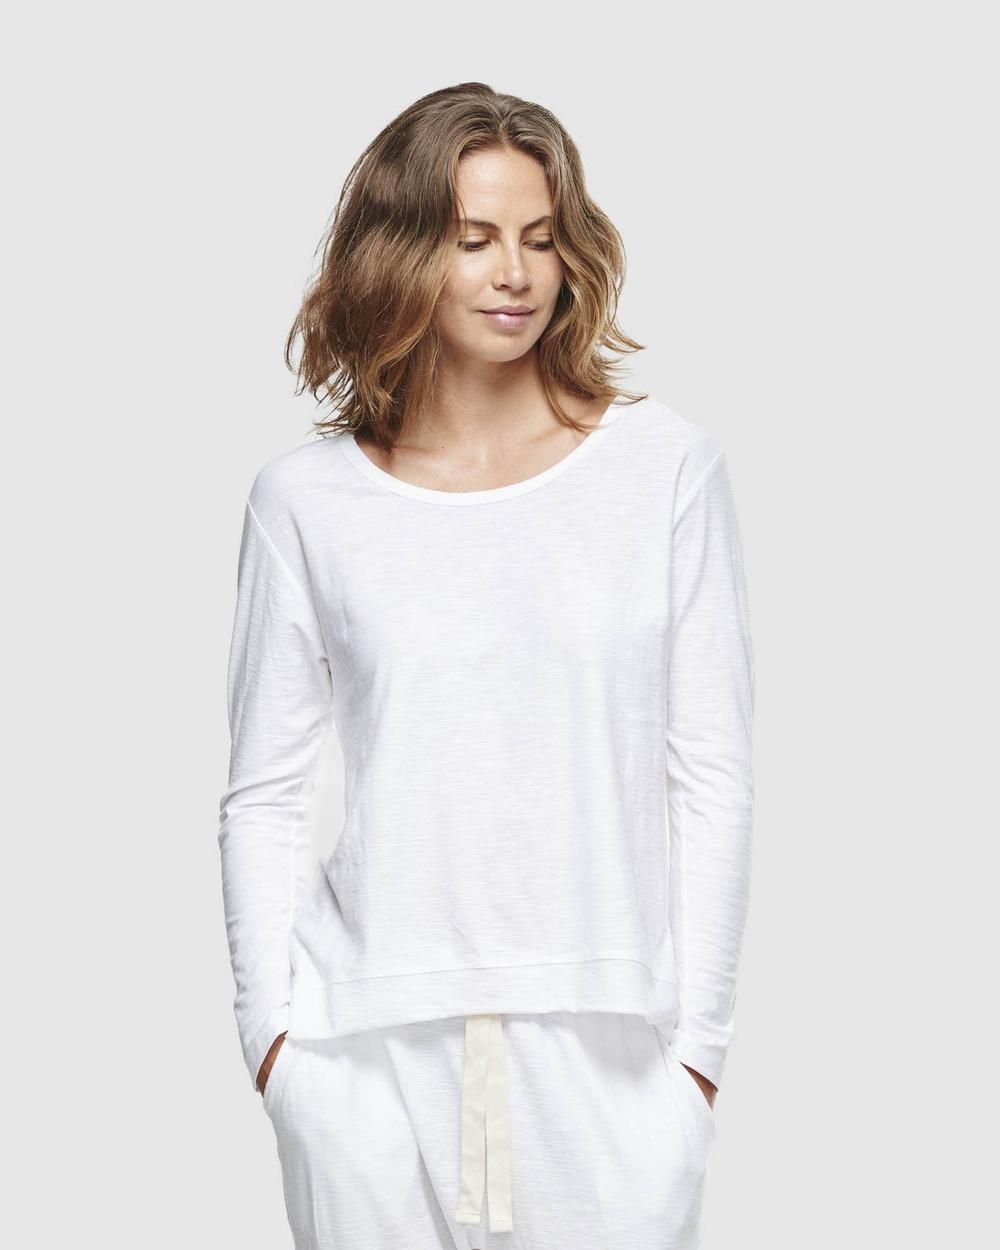 Cloth & Co. - Organic Cotton Slub Long Sleeve - T-Shirts & Singlets (White) Organic Cotton Slub Long Sleeve